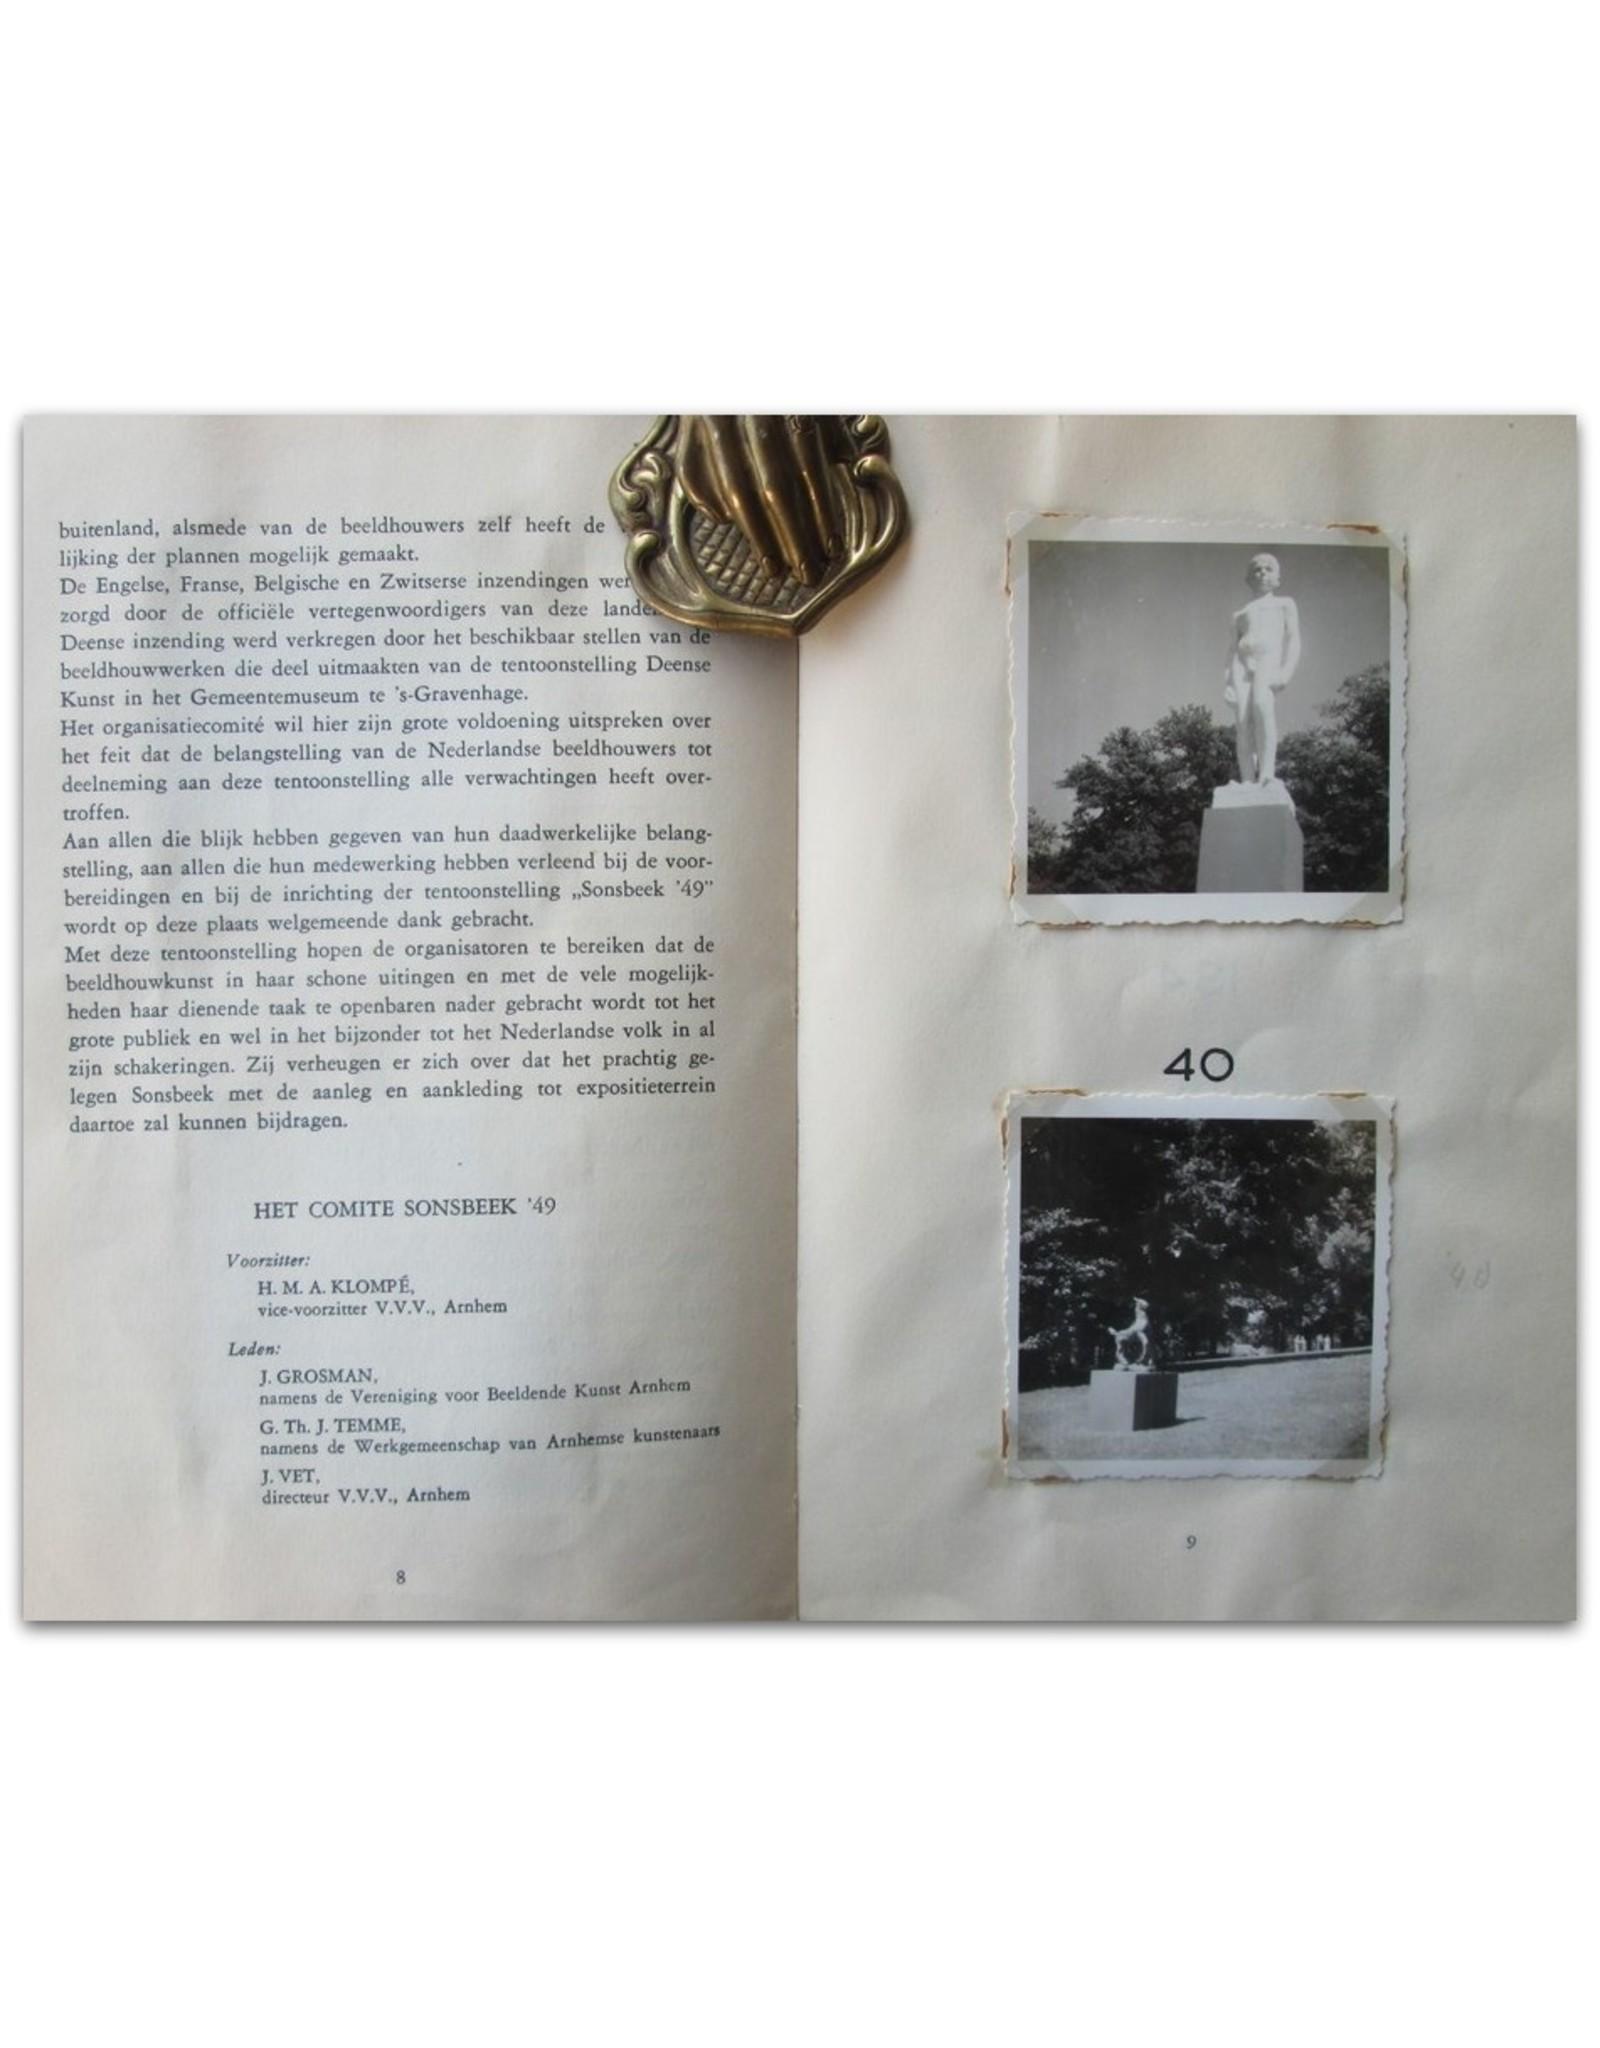 Sonsbeek '49 Europese Beeldhouwkunst in de open lucht: Arnhem 1 juli - 18 september 1949